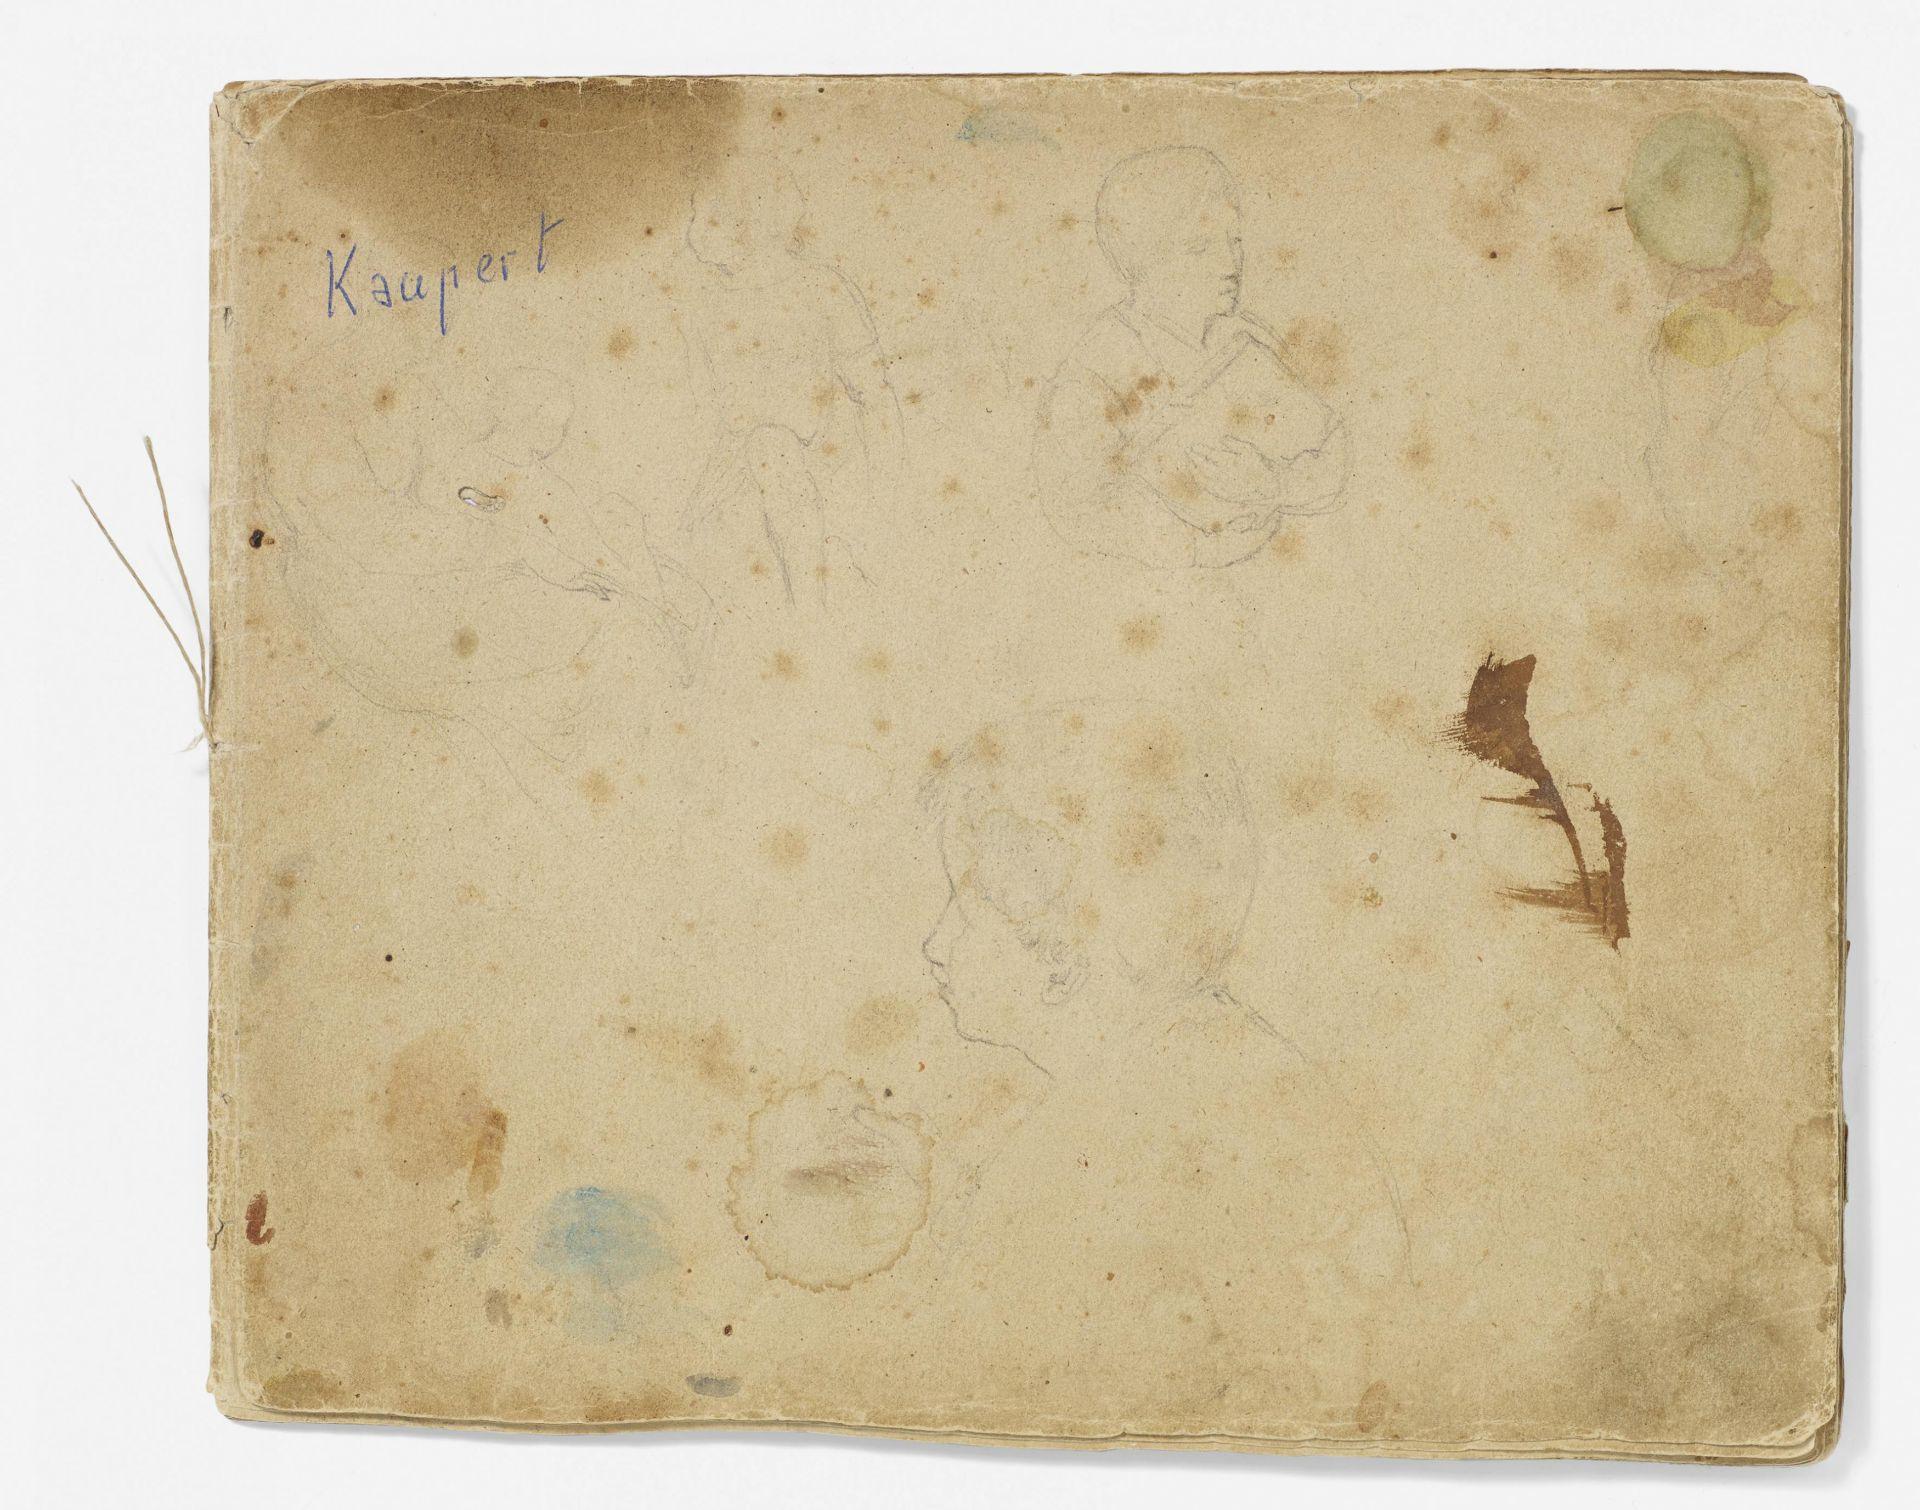 Kaupert, Gustav Kassel 1819 - 1897  Sketchbook, two booklets, each ca. 17 pages. Architectural - Bild 2 aus 8